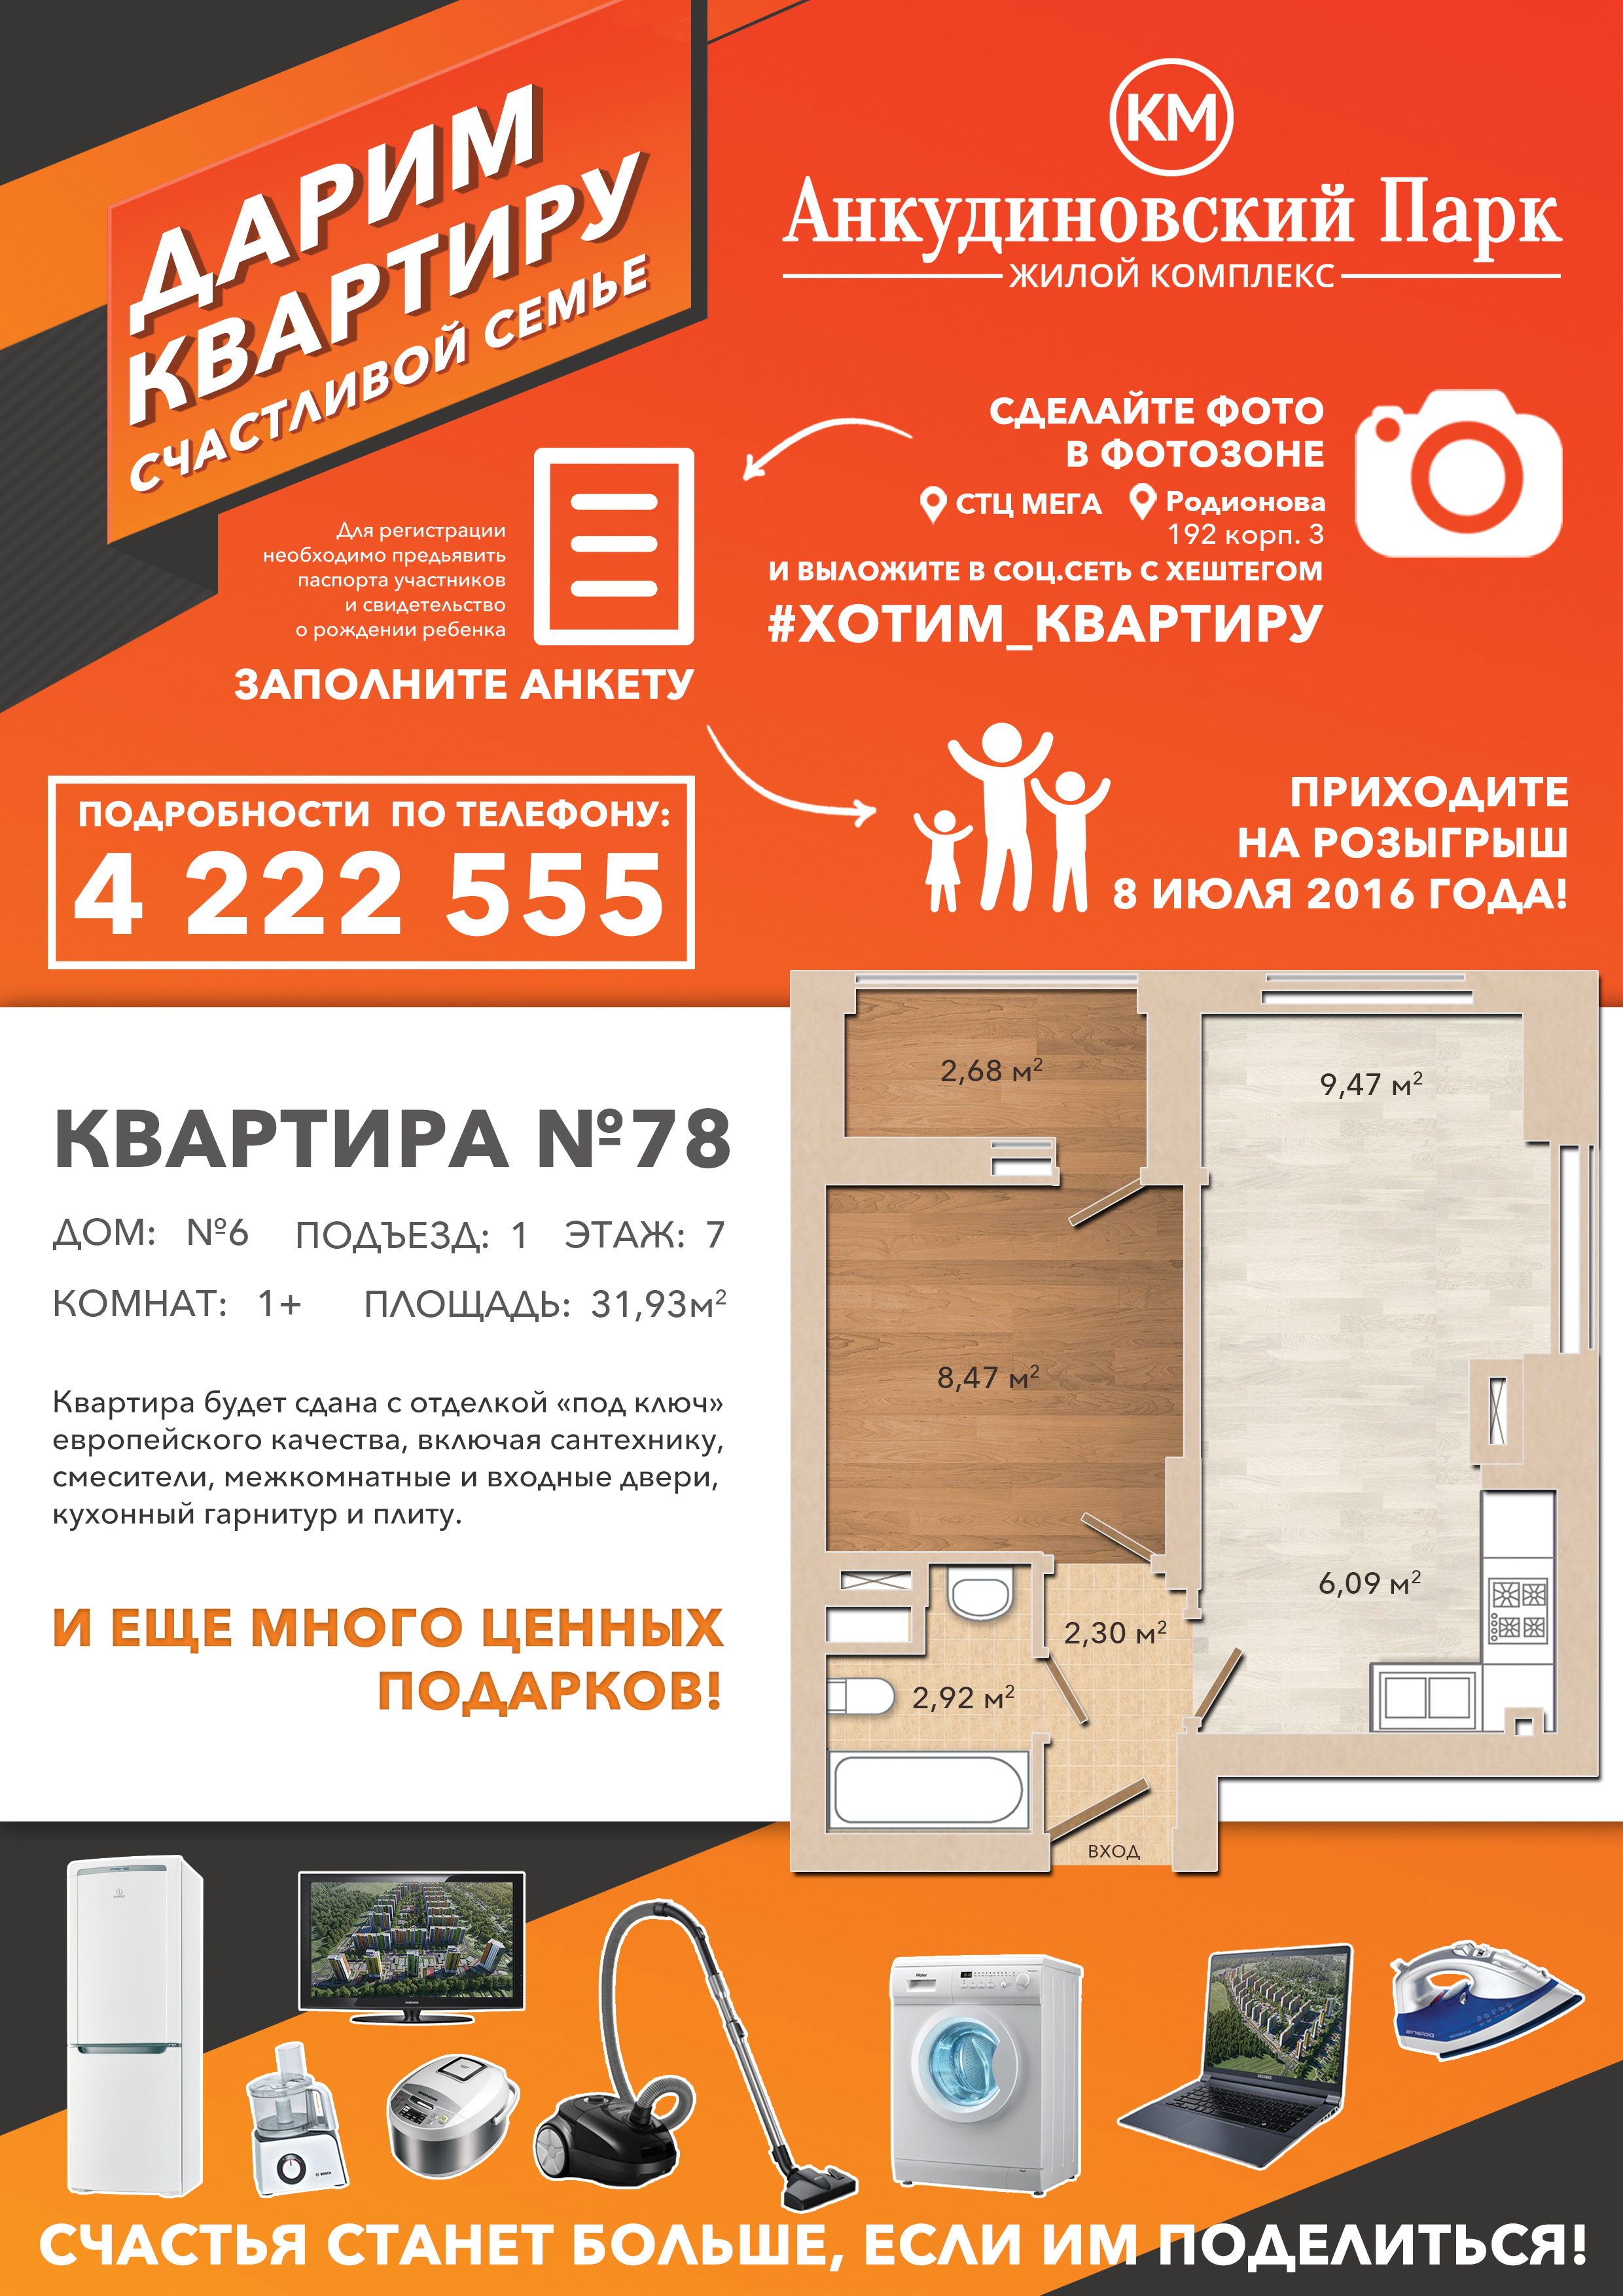 КМ Анкудиновский Парк дарит квартиру за счастливое фото